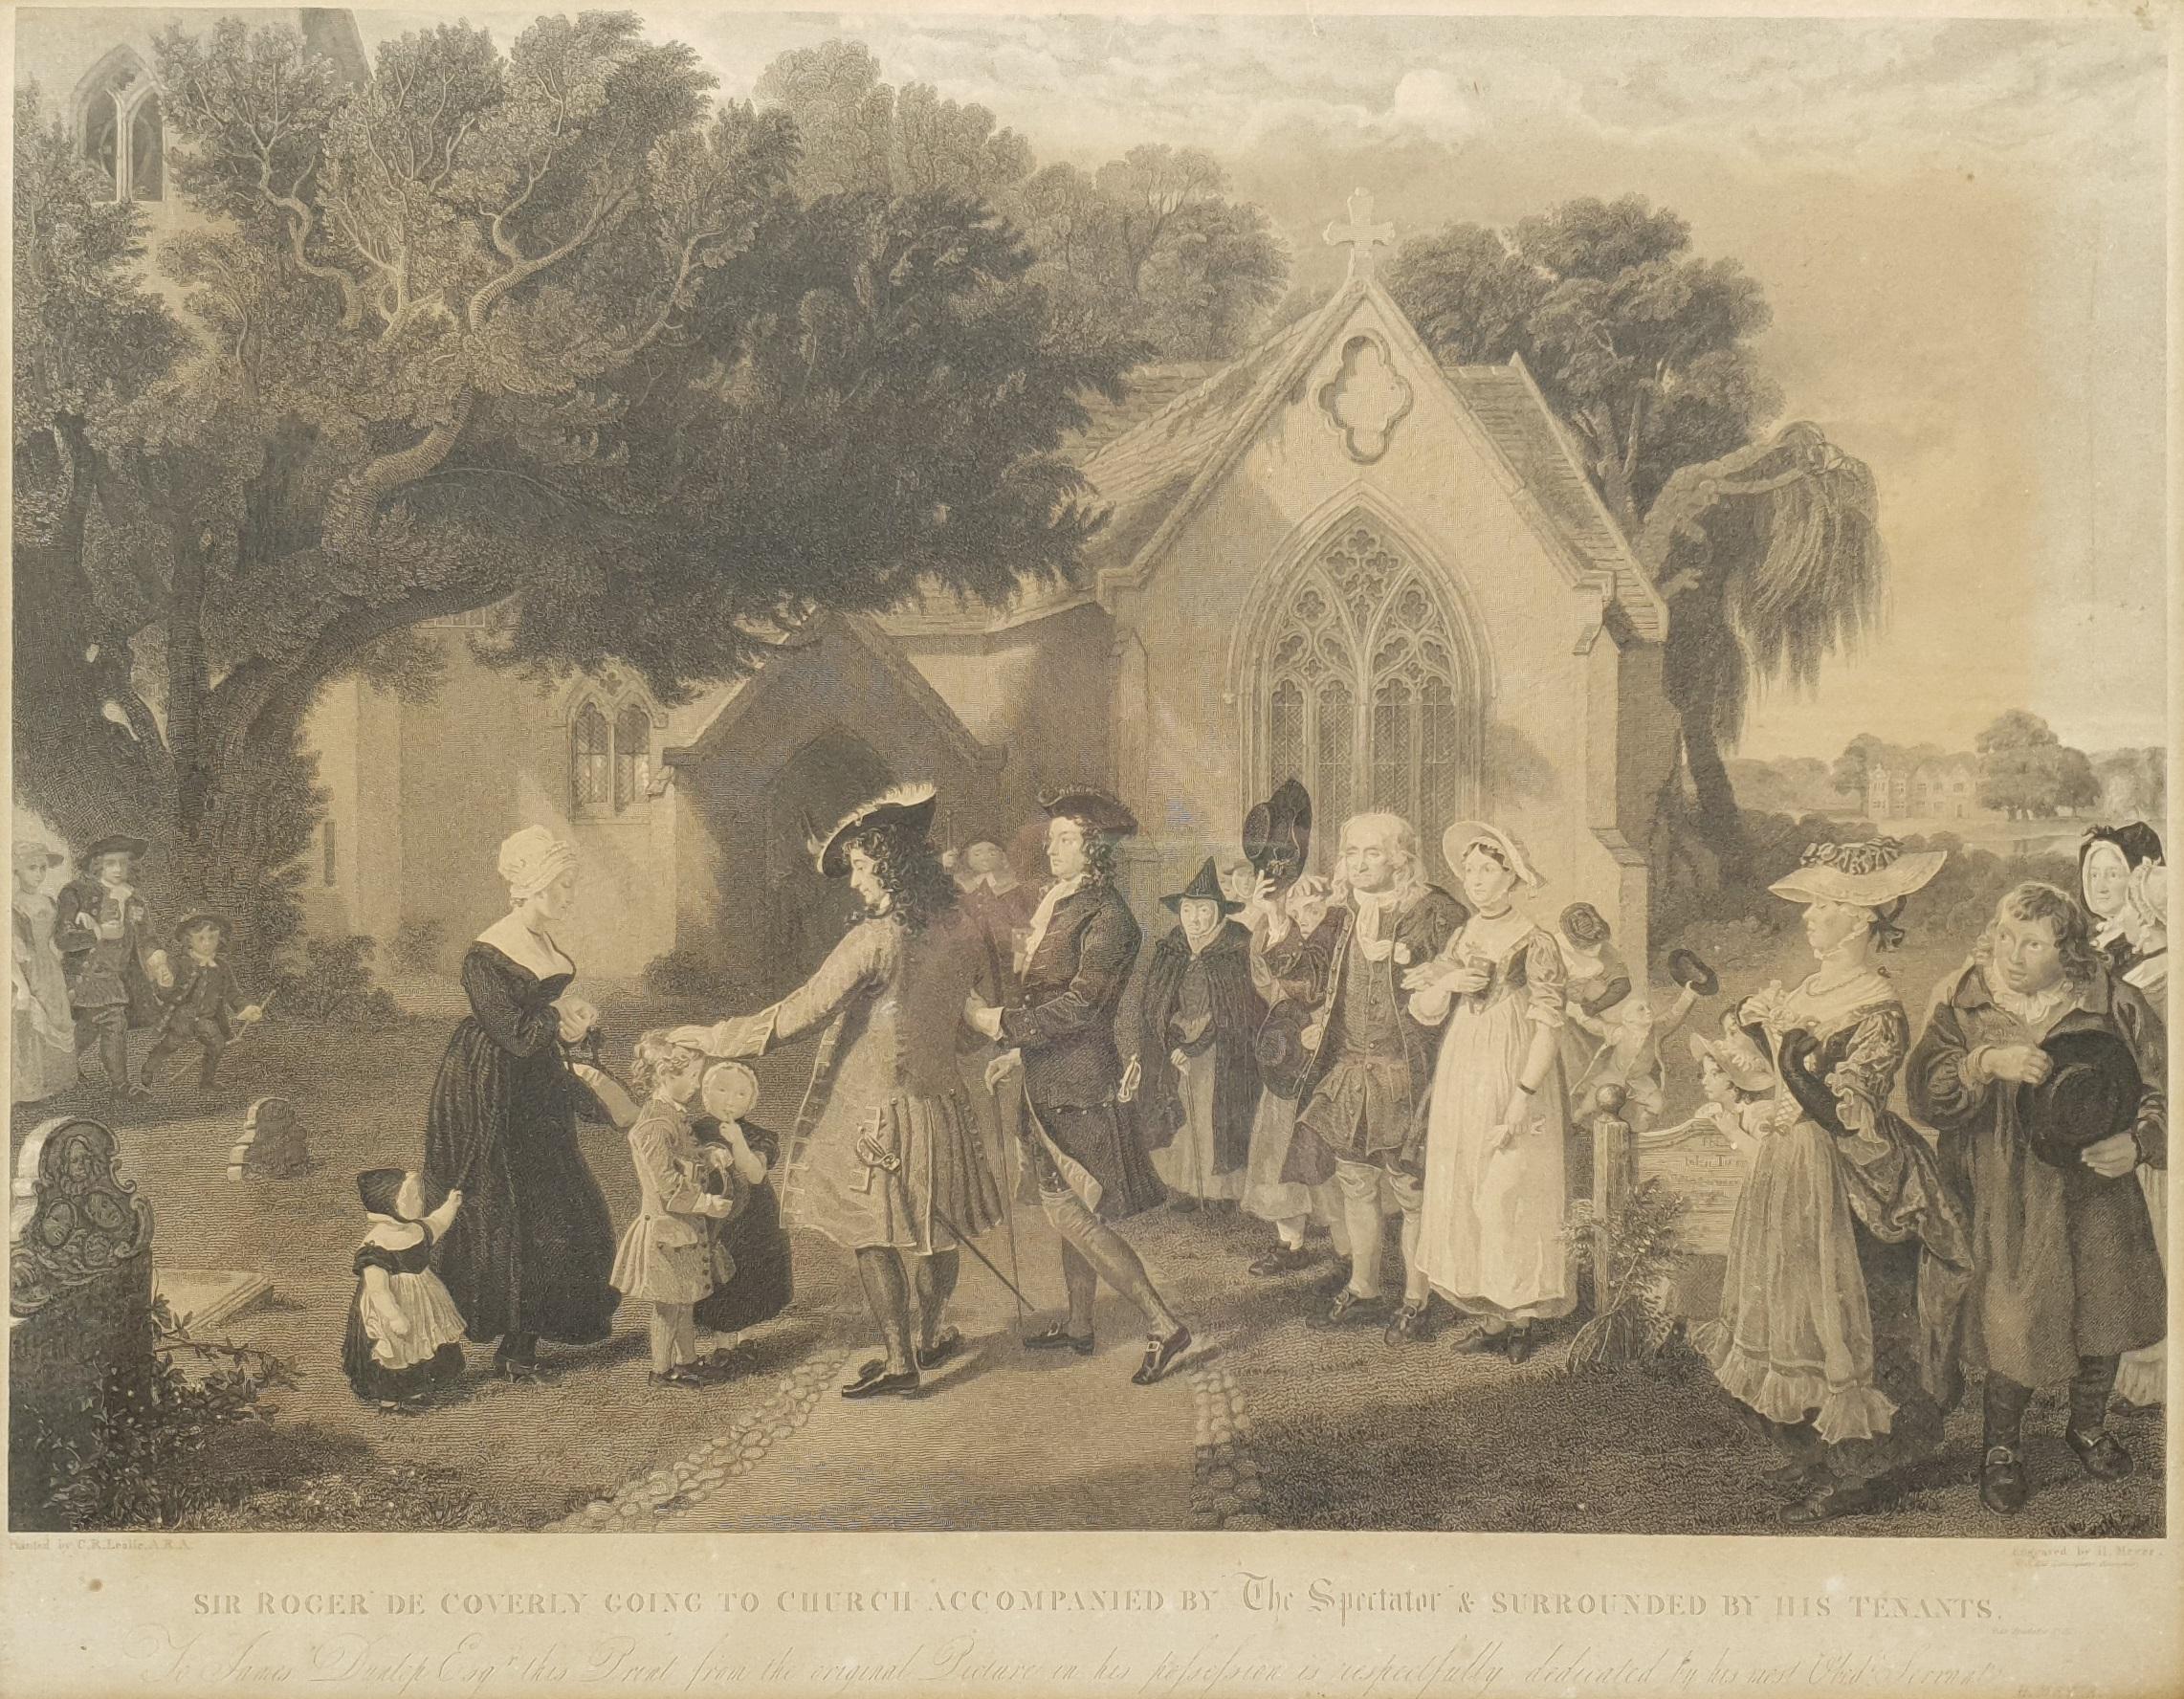 Henry Meyer RBA (British 1780-1847) after Charles Robert Leslie RA (1794-1859): 'Sir Roger De Coverl